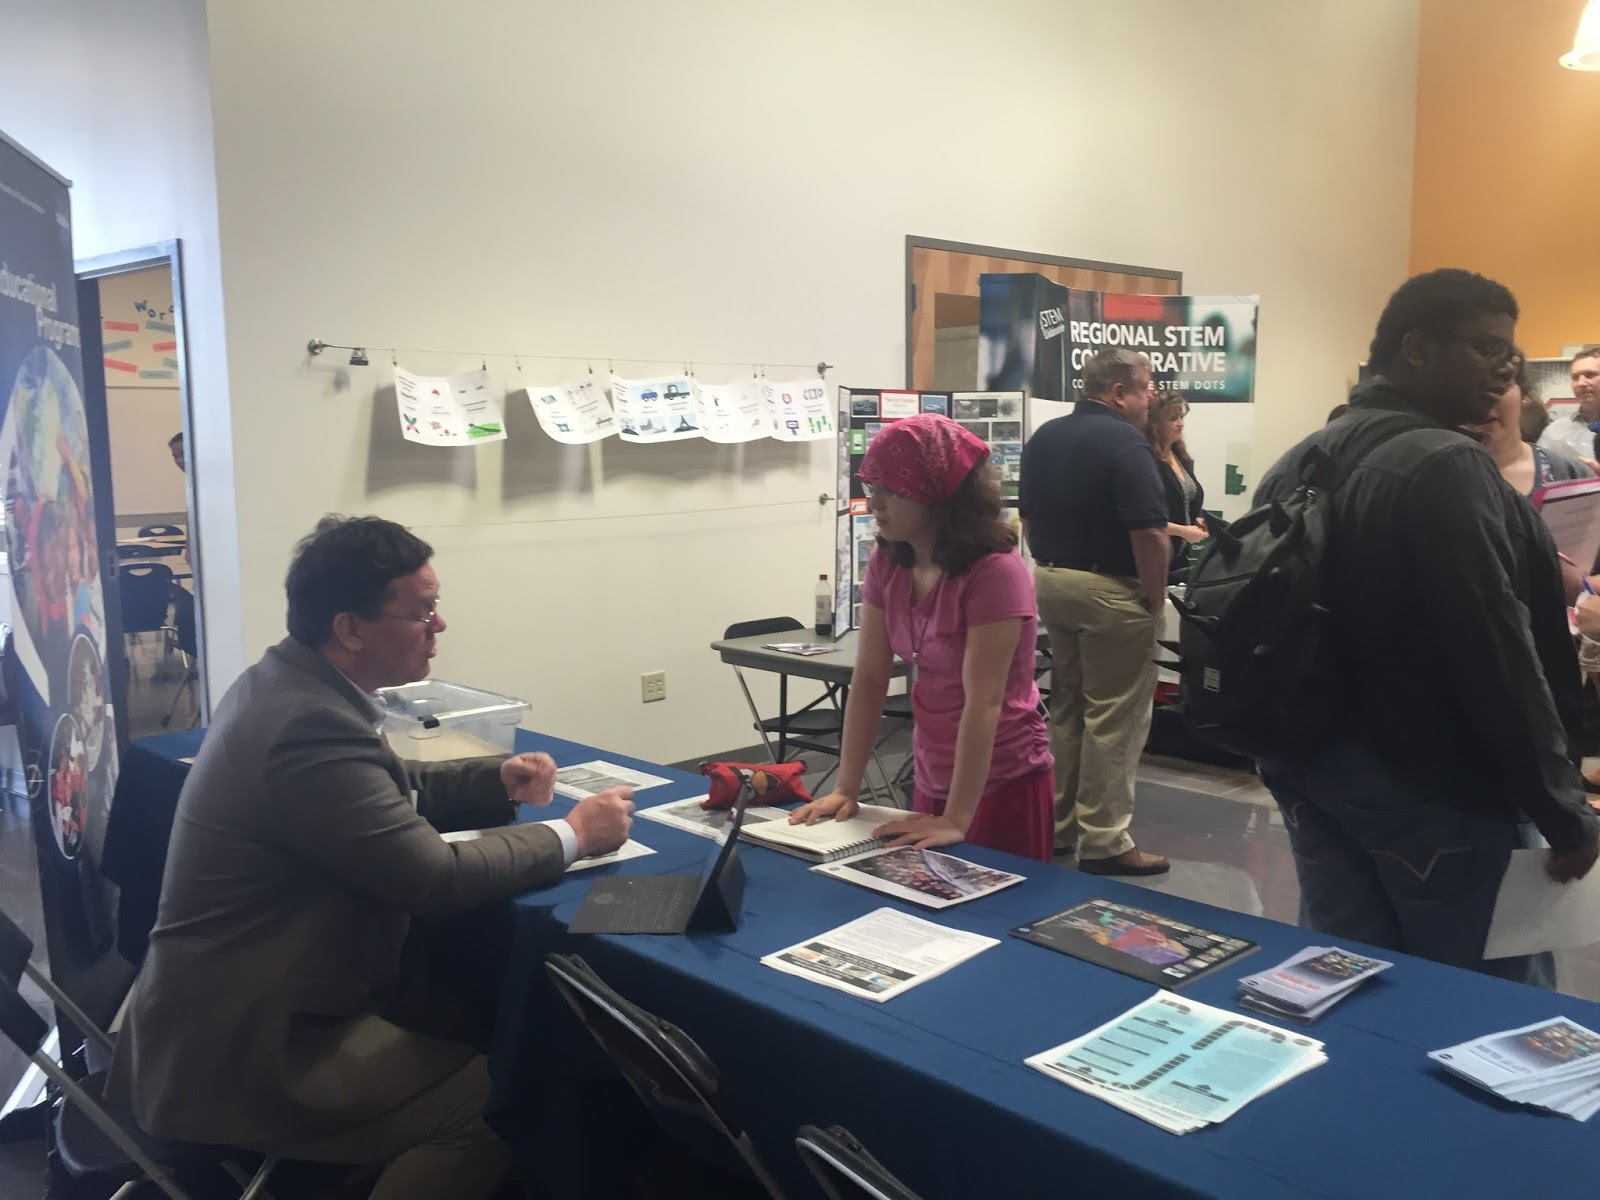 Dayton Regional STEM School News and Events: DRSS 2016